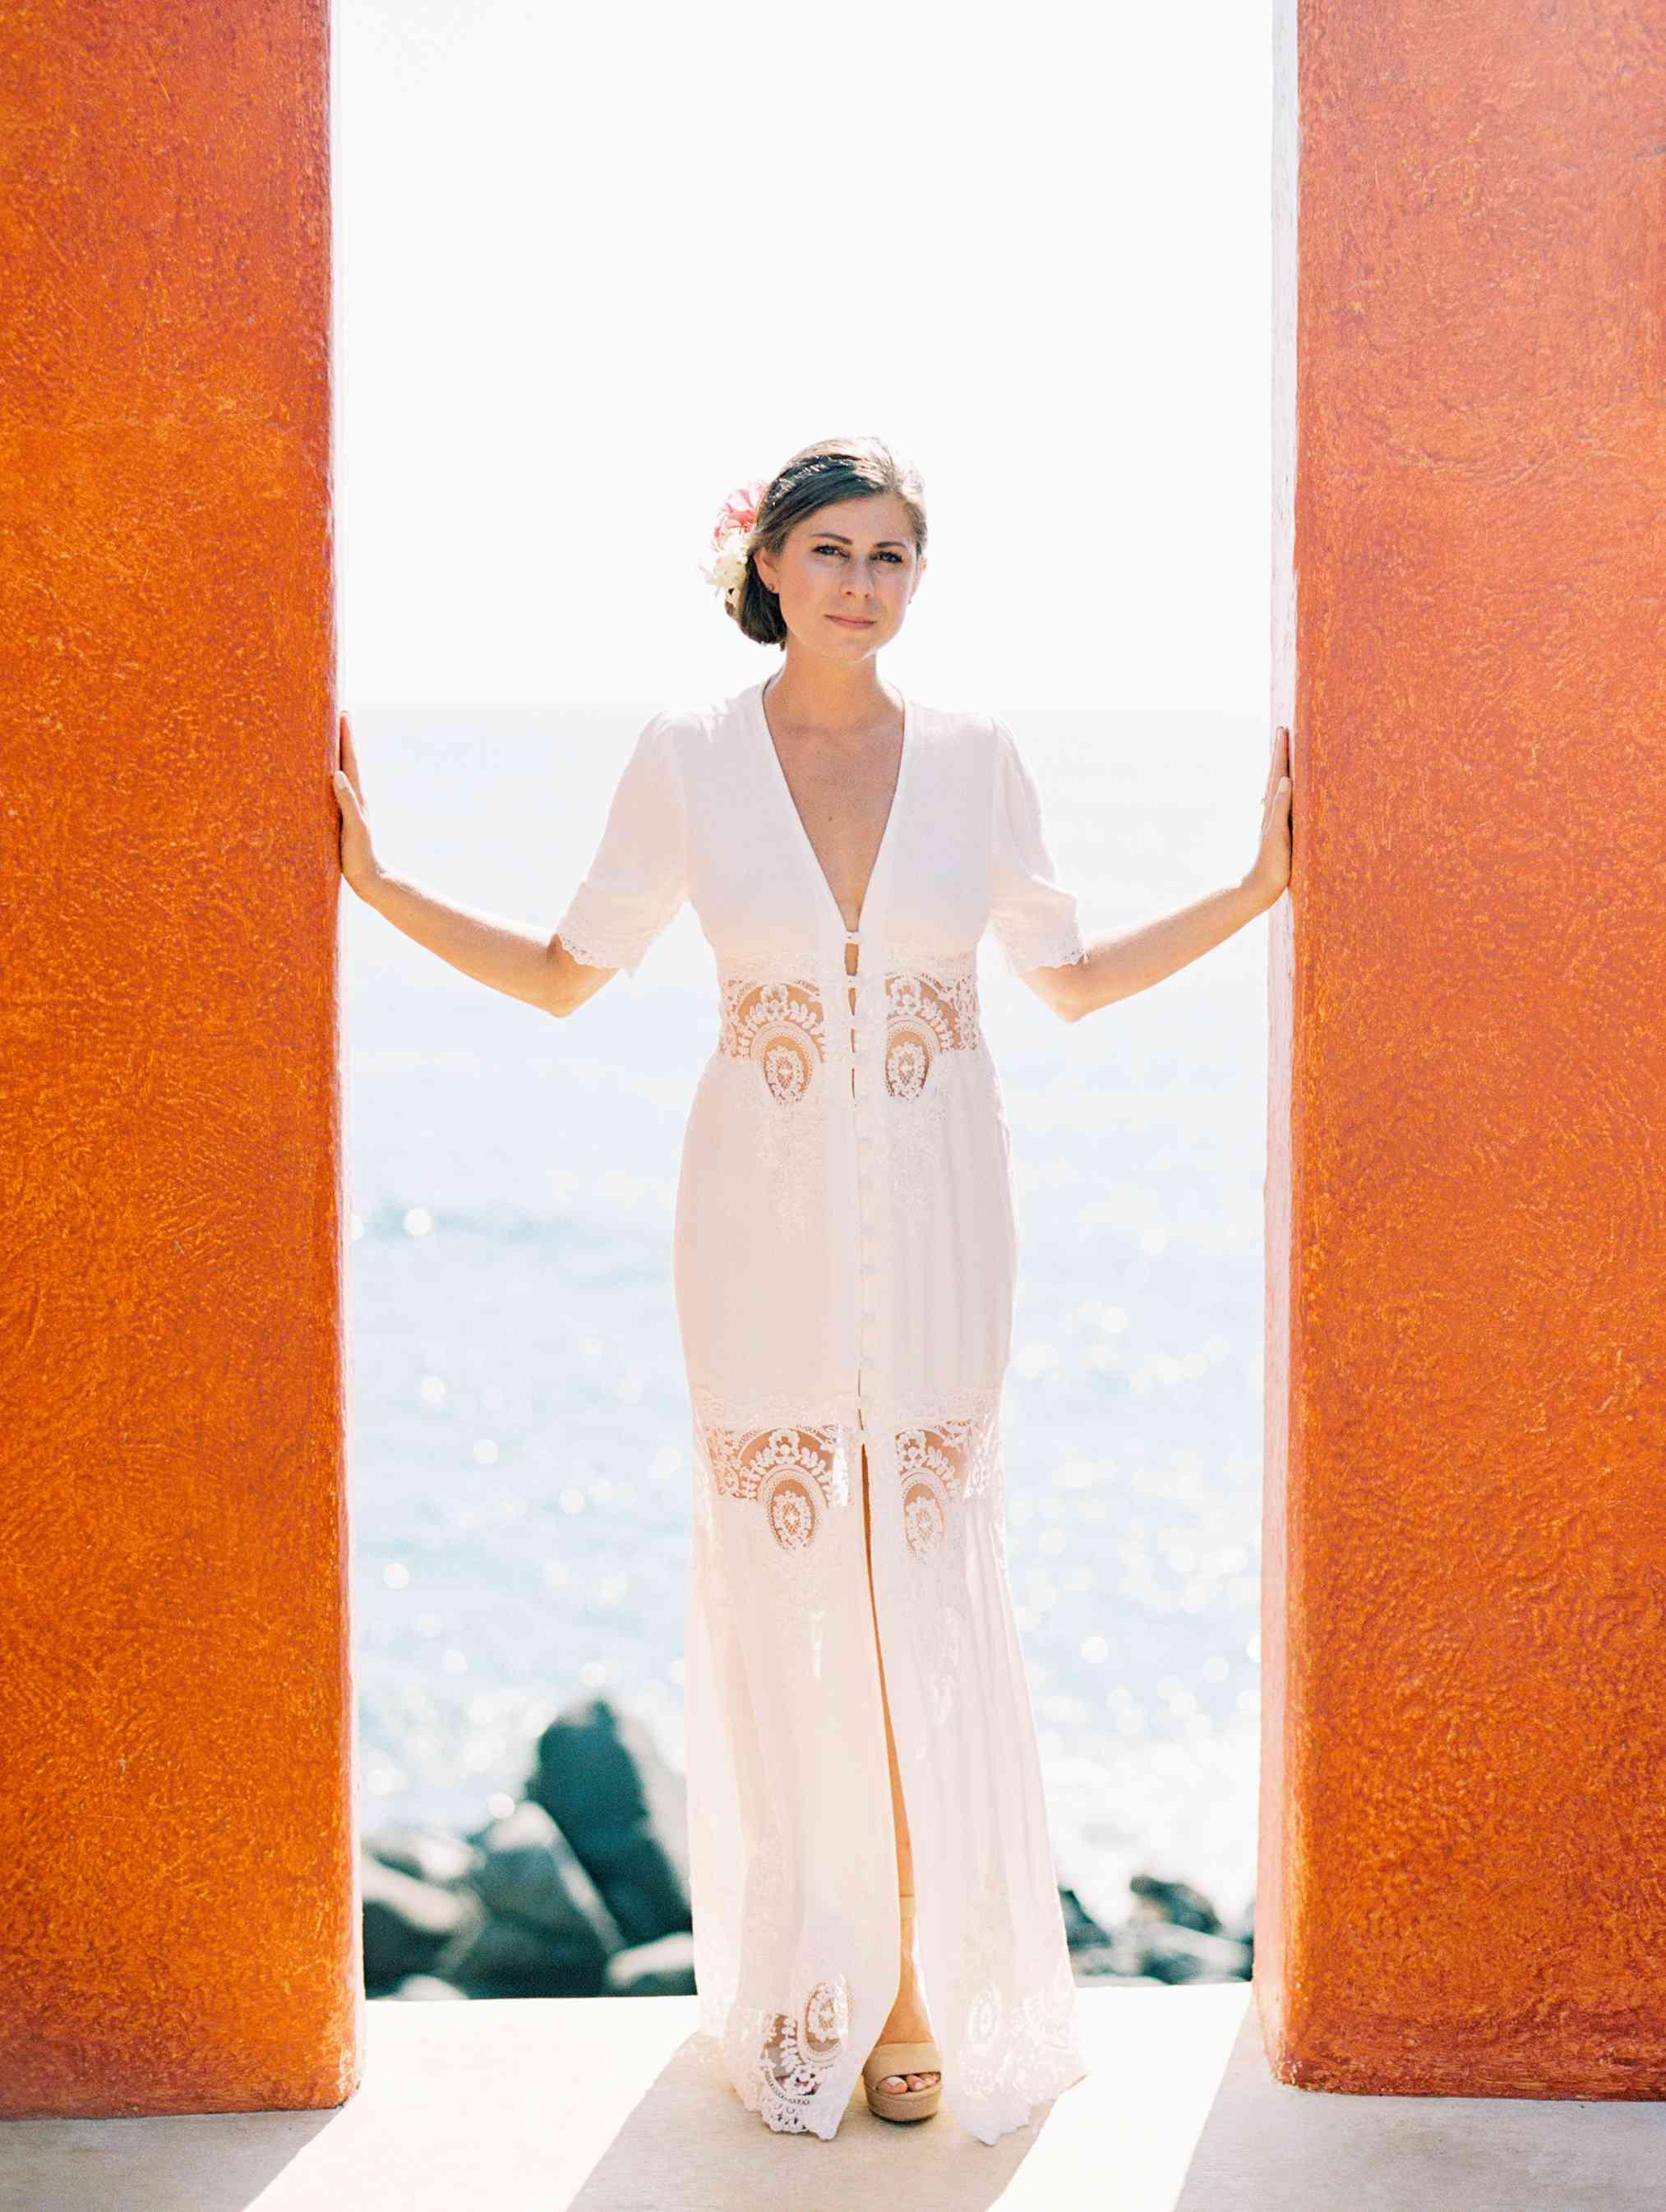 Bride Solo Beach Shot